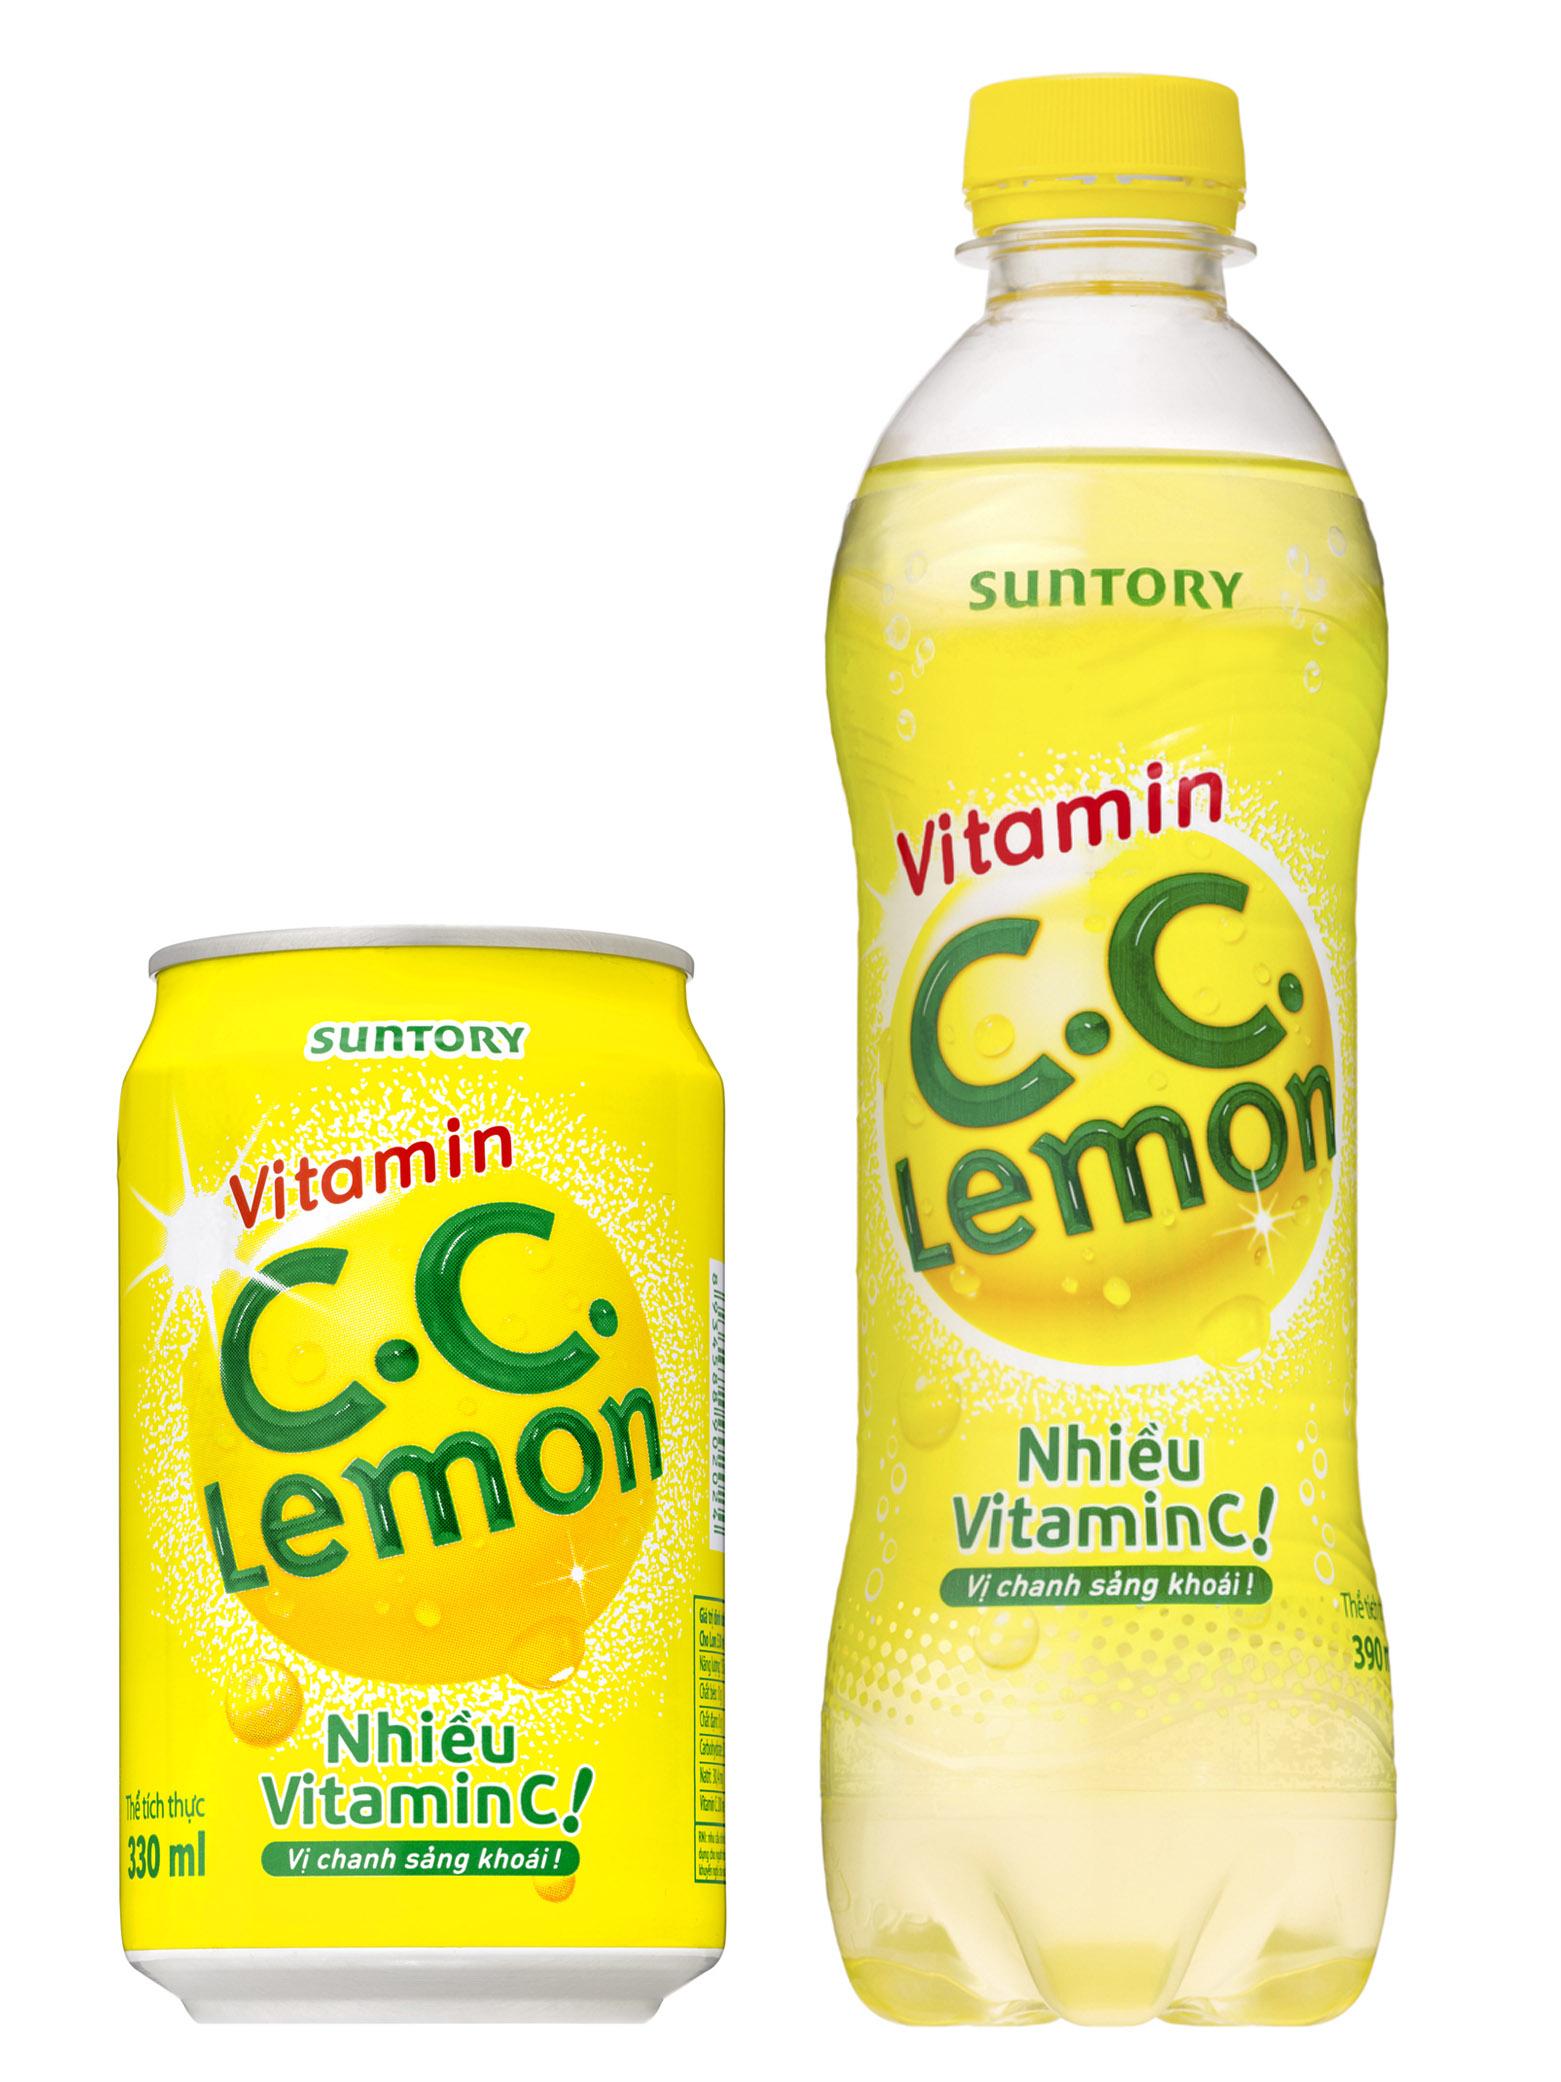 C c lemon makes its debut in vietnam